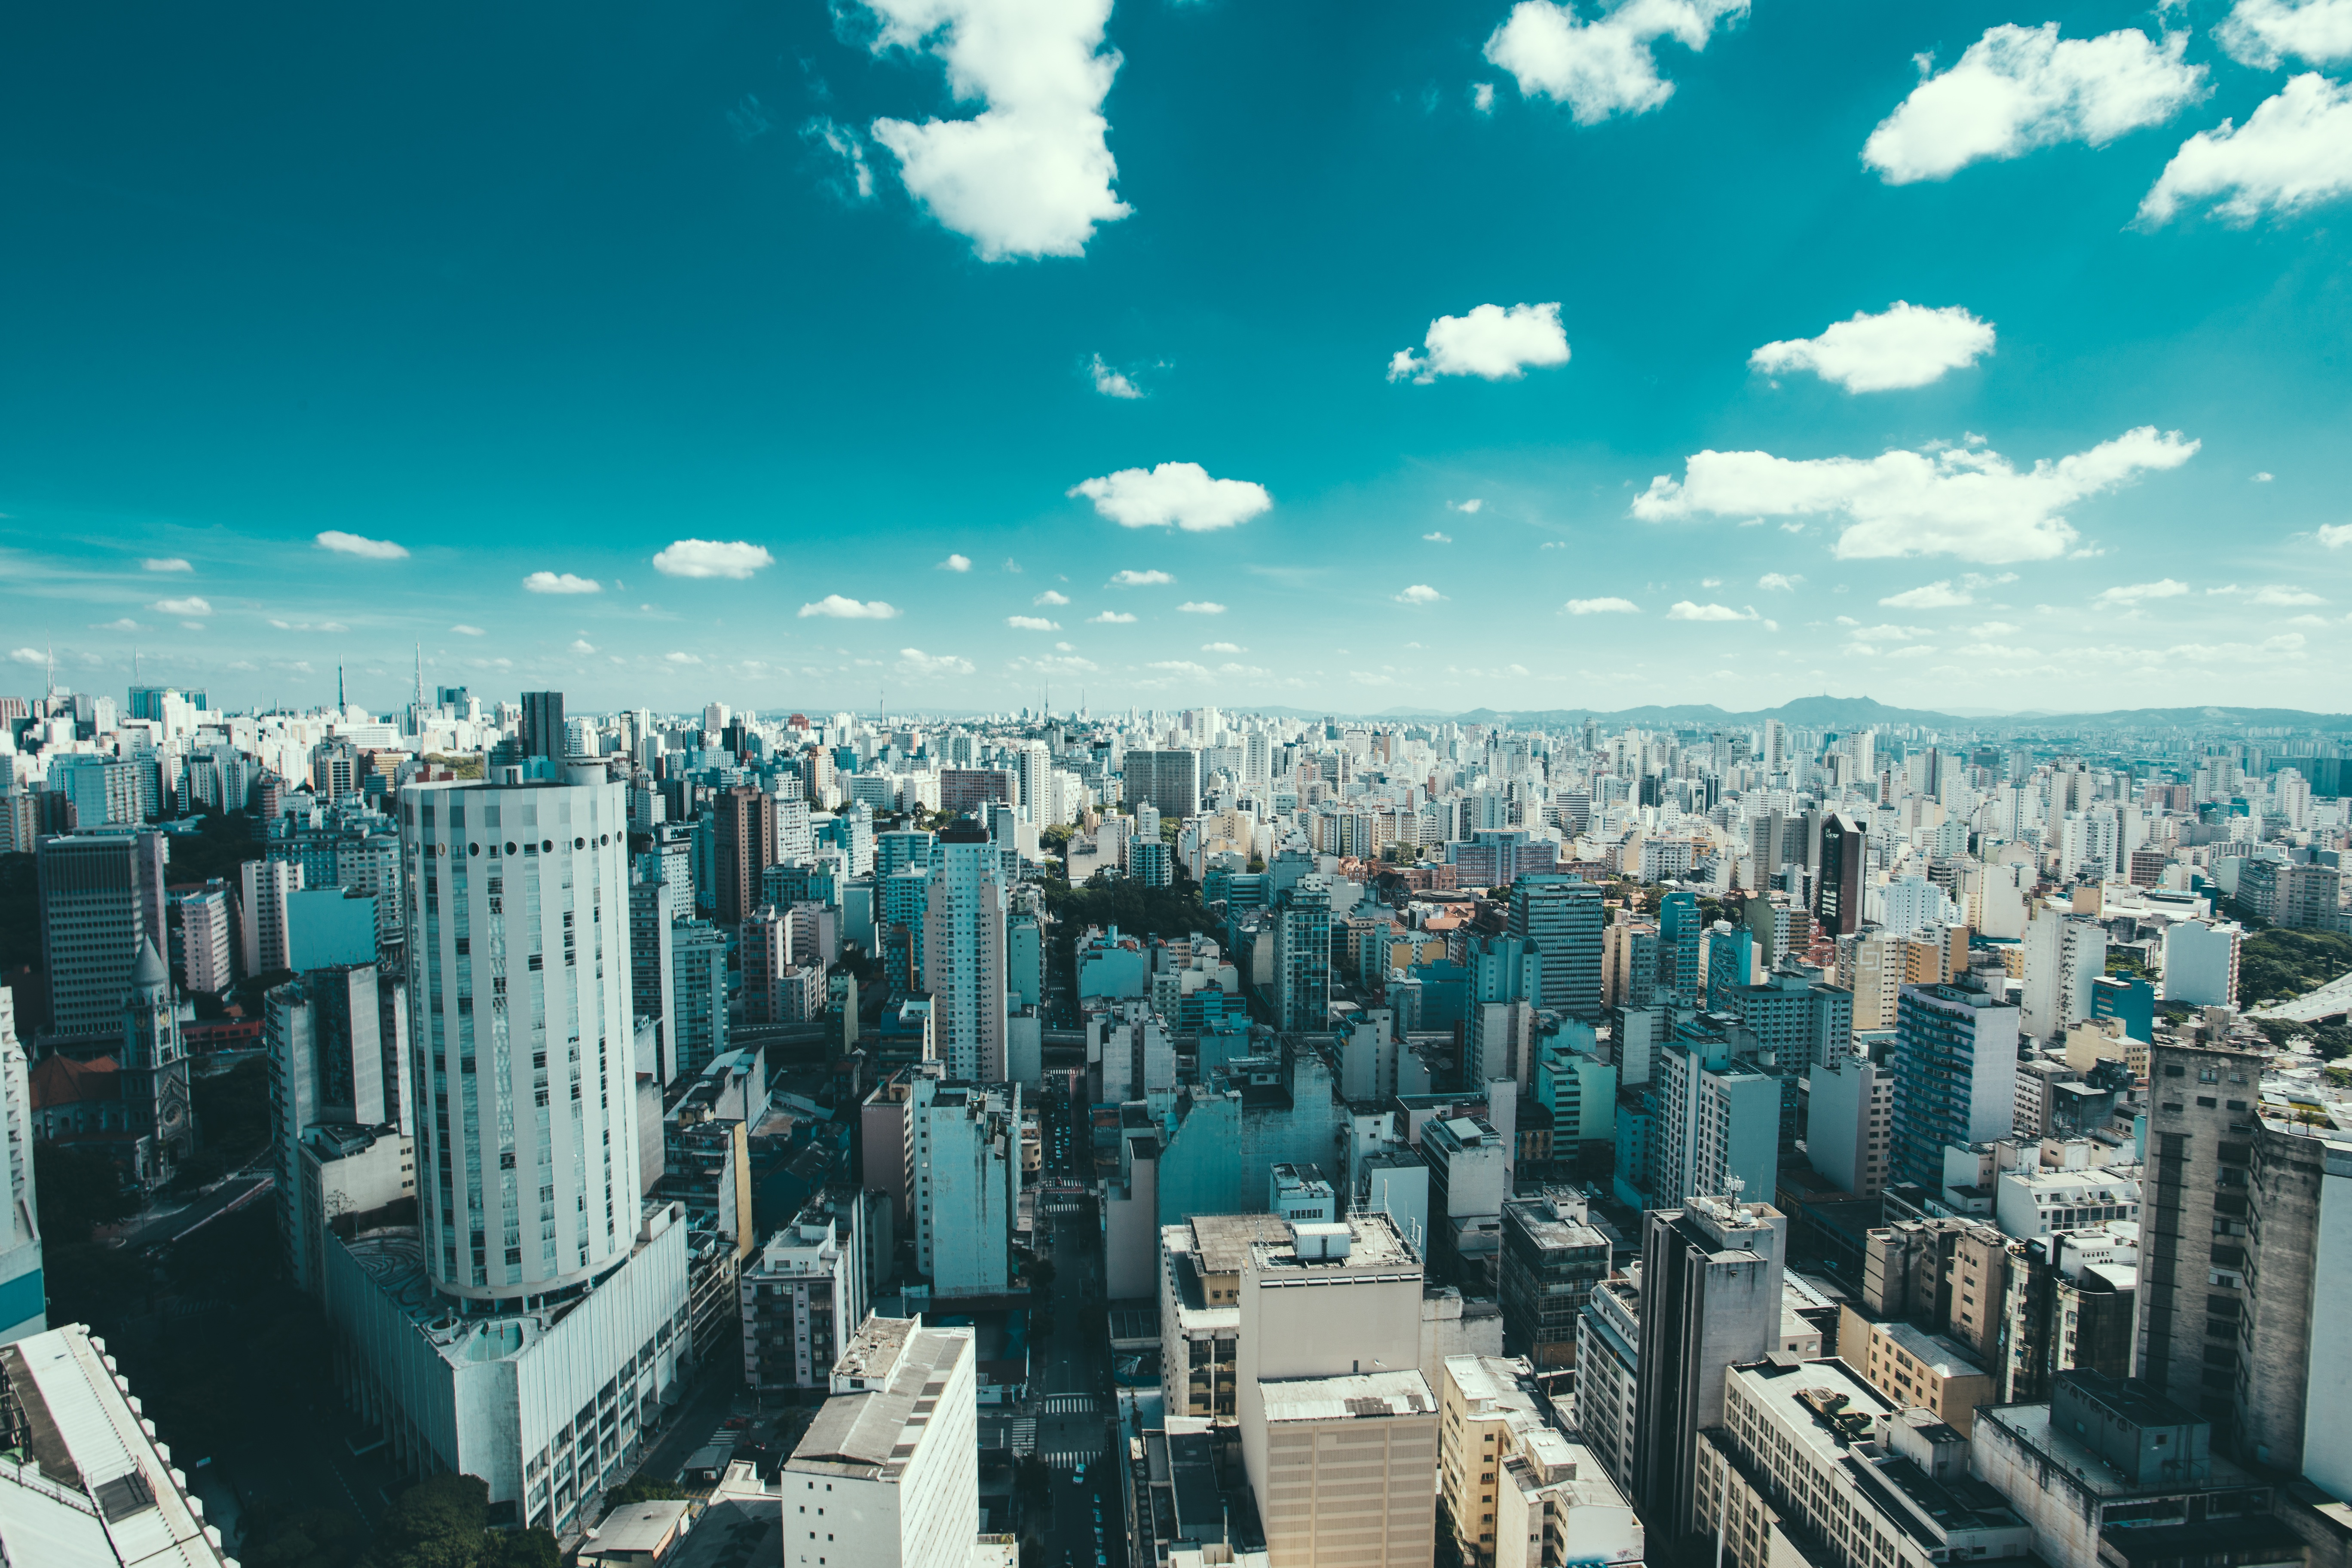 Júlio Mesquita - São Paulo